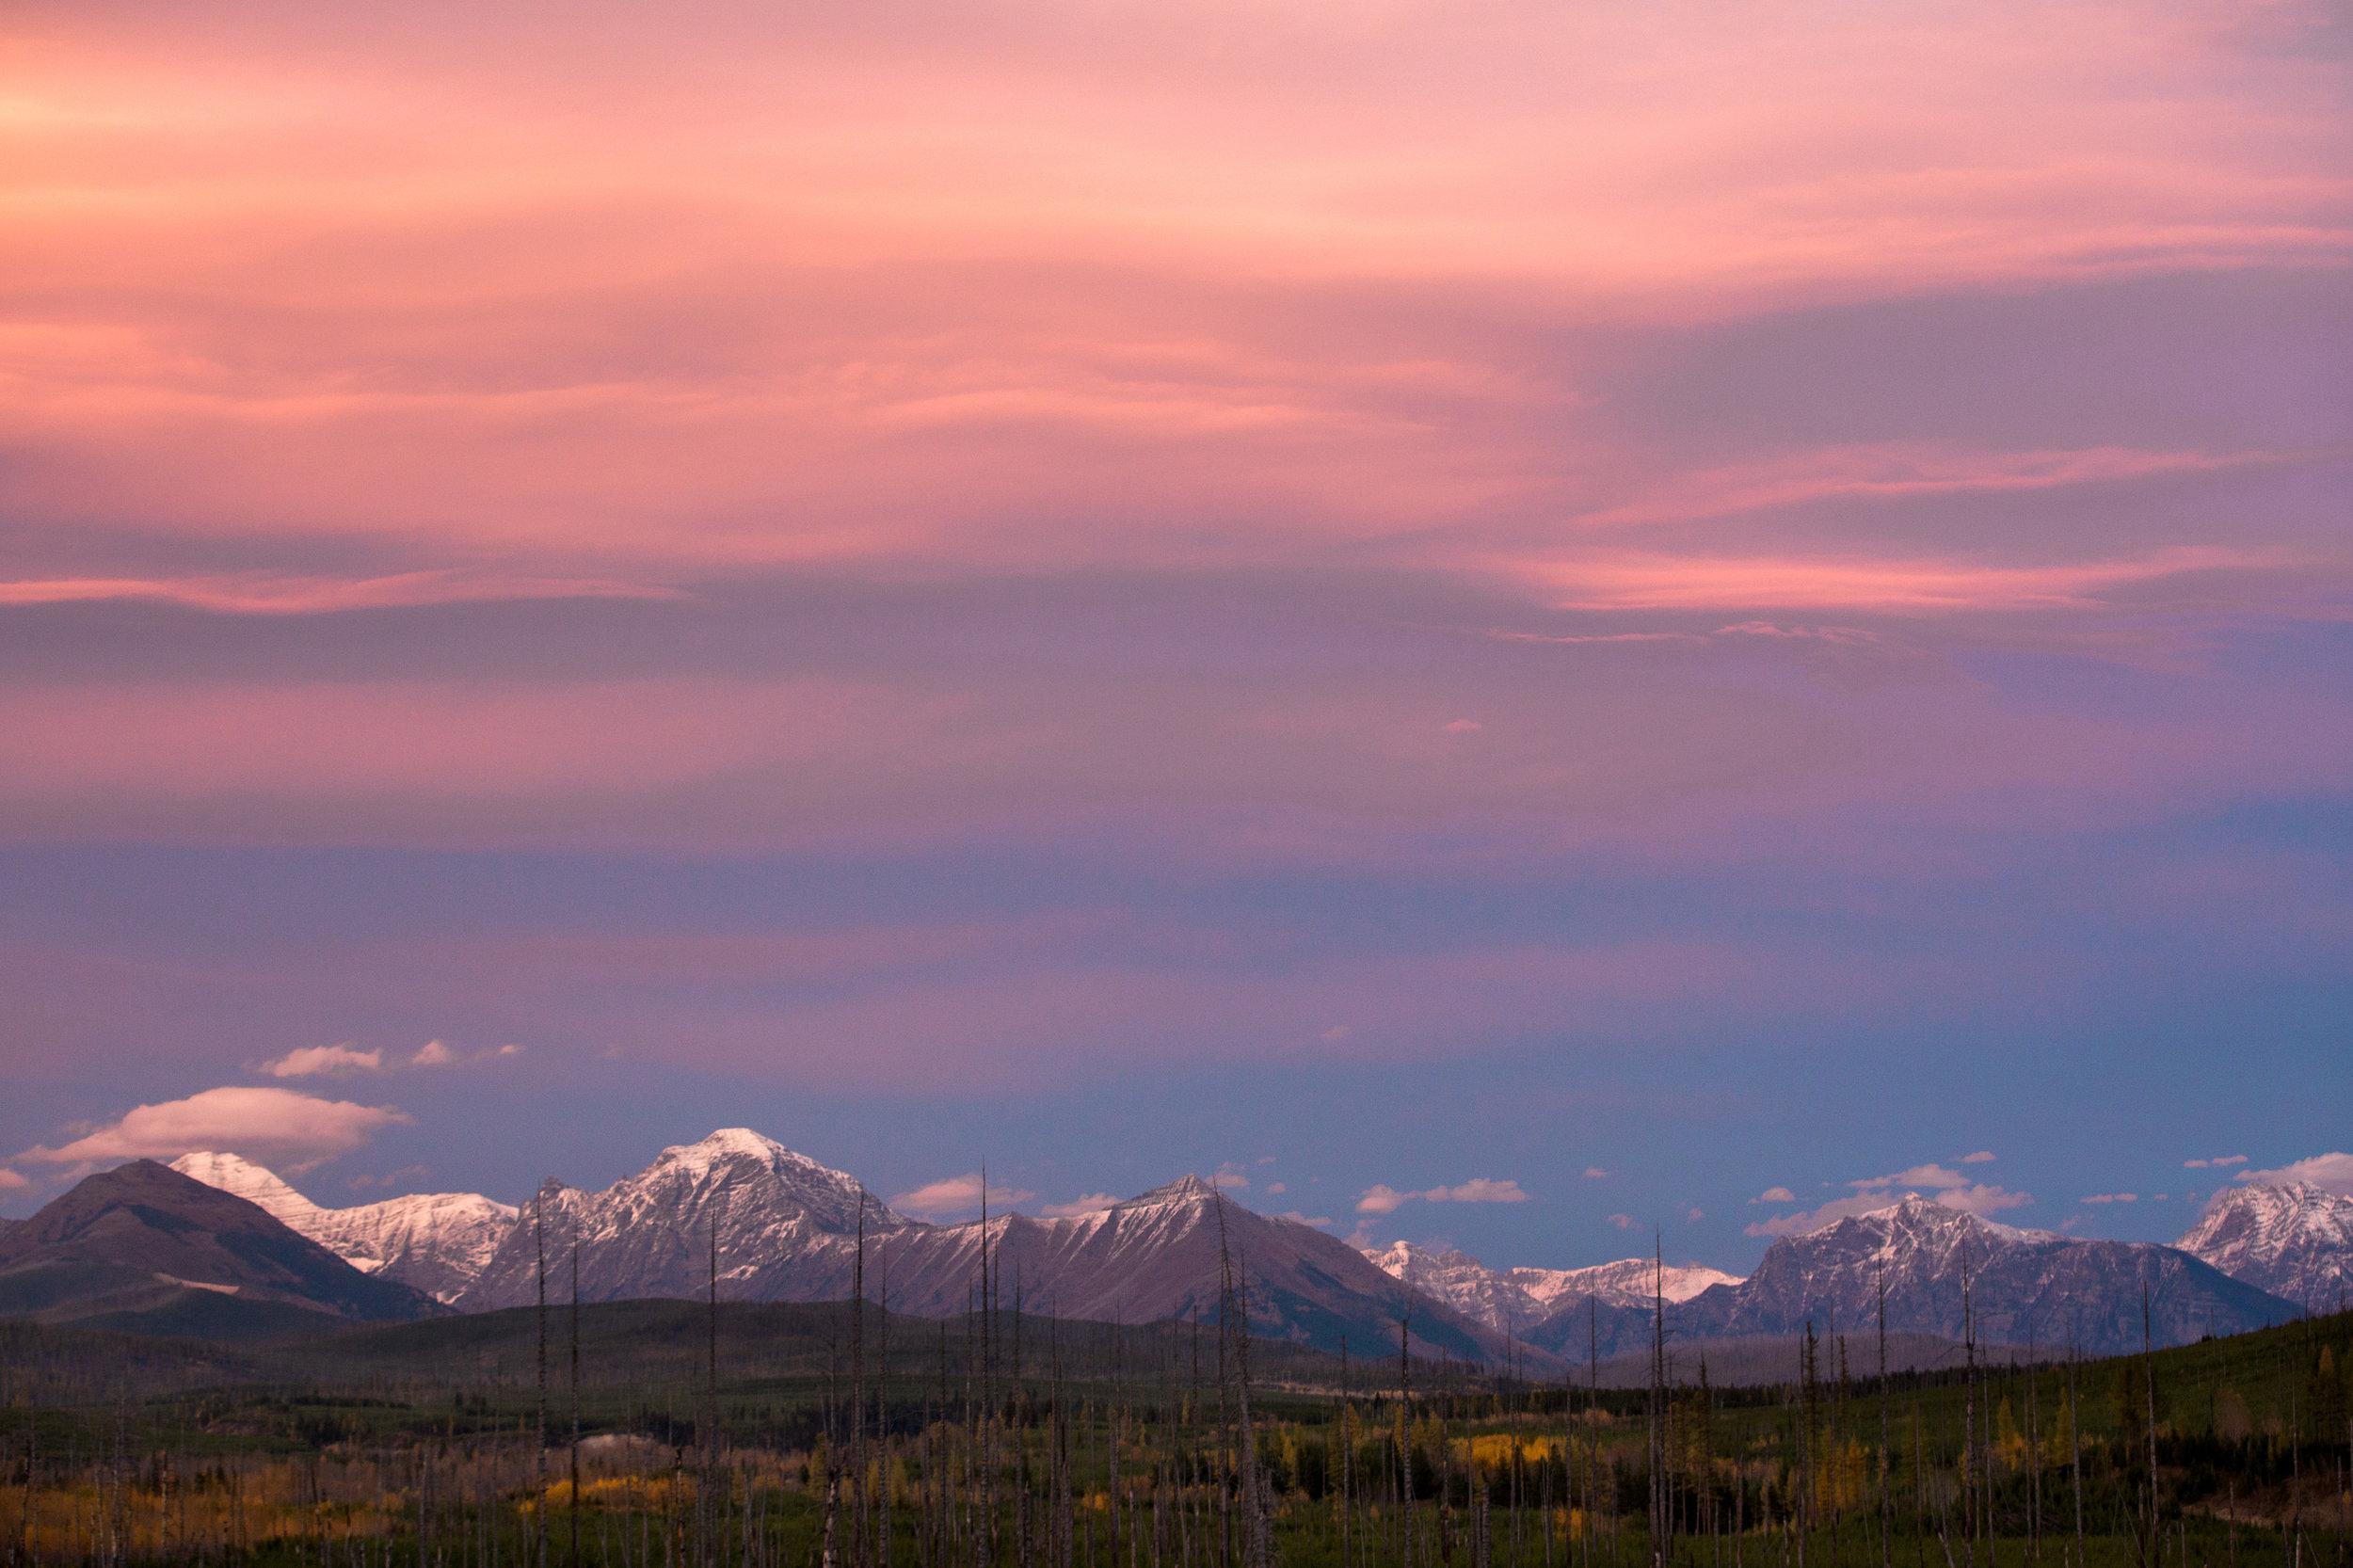 CindyGiovagnoli_outdoor_adventure_photography_Grand_Teton_Yellowstone_Glacier_National_Park_Montana_Wyoming_South_Dakota_Mount_Rushmore_Badlands-011.jpg